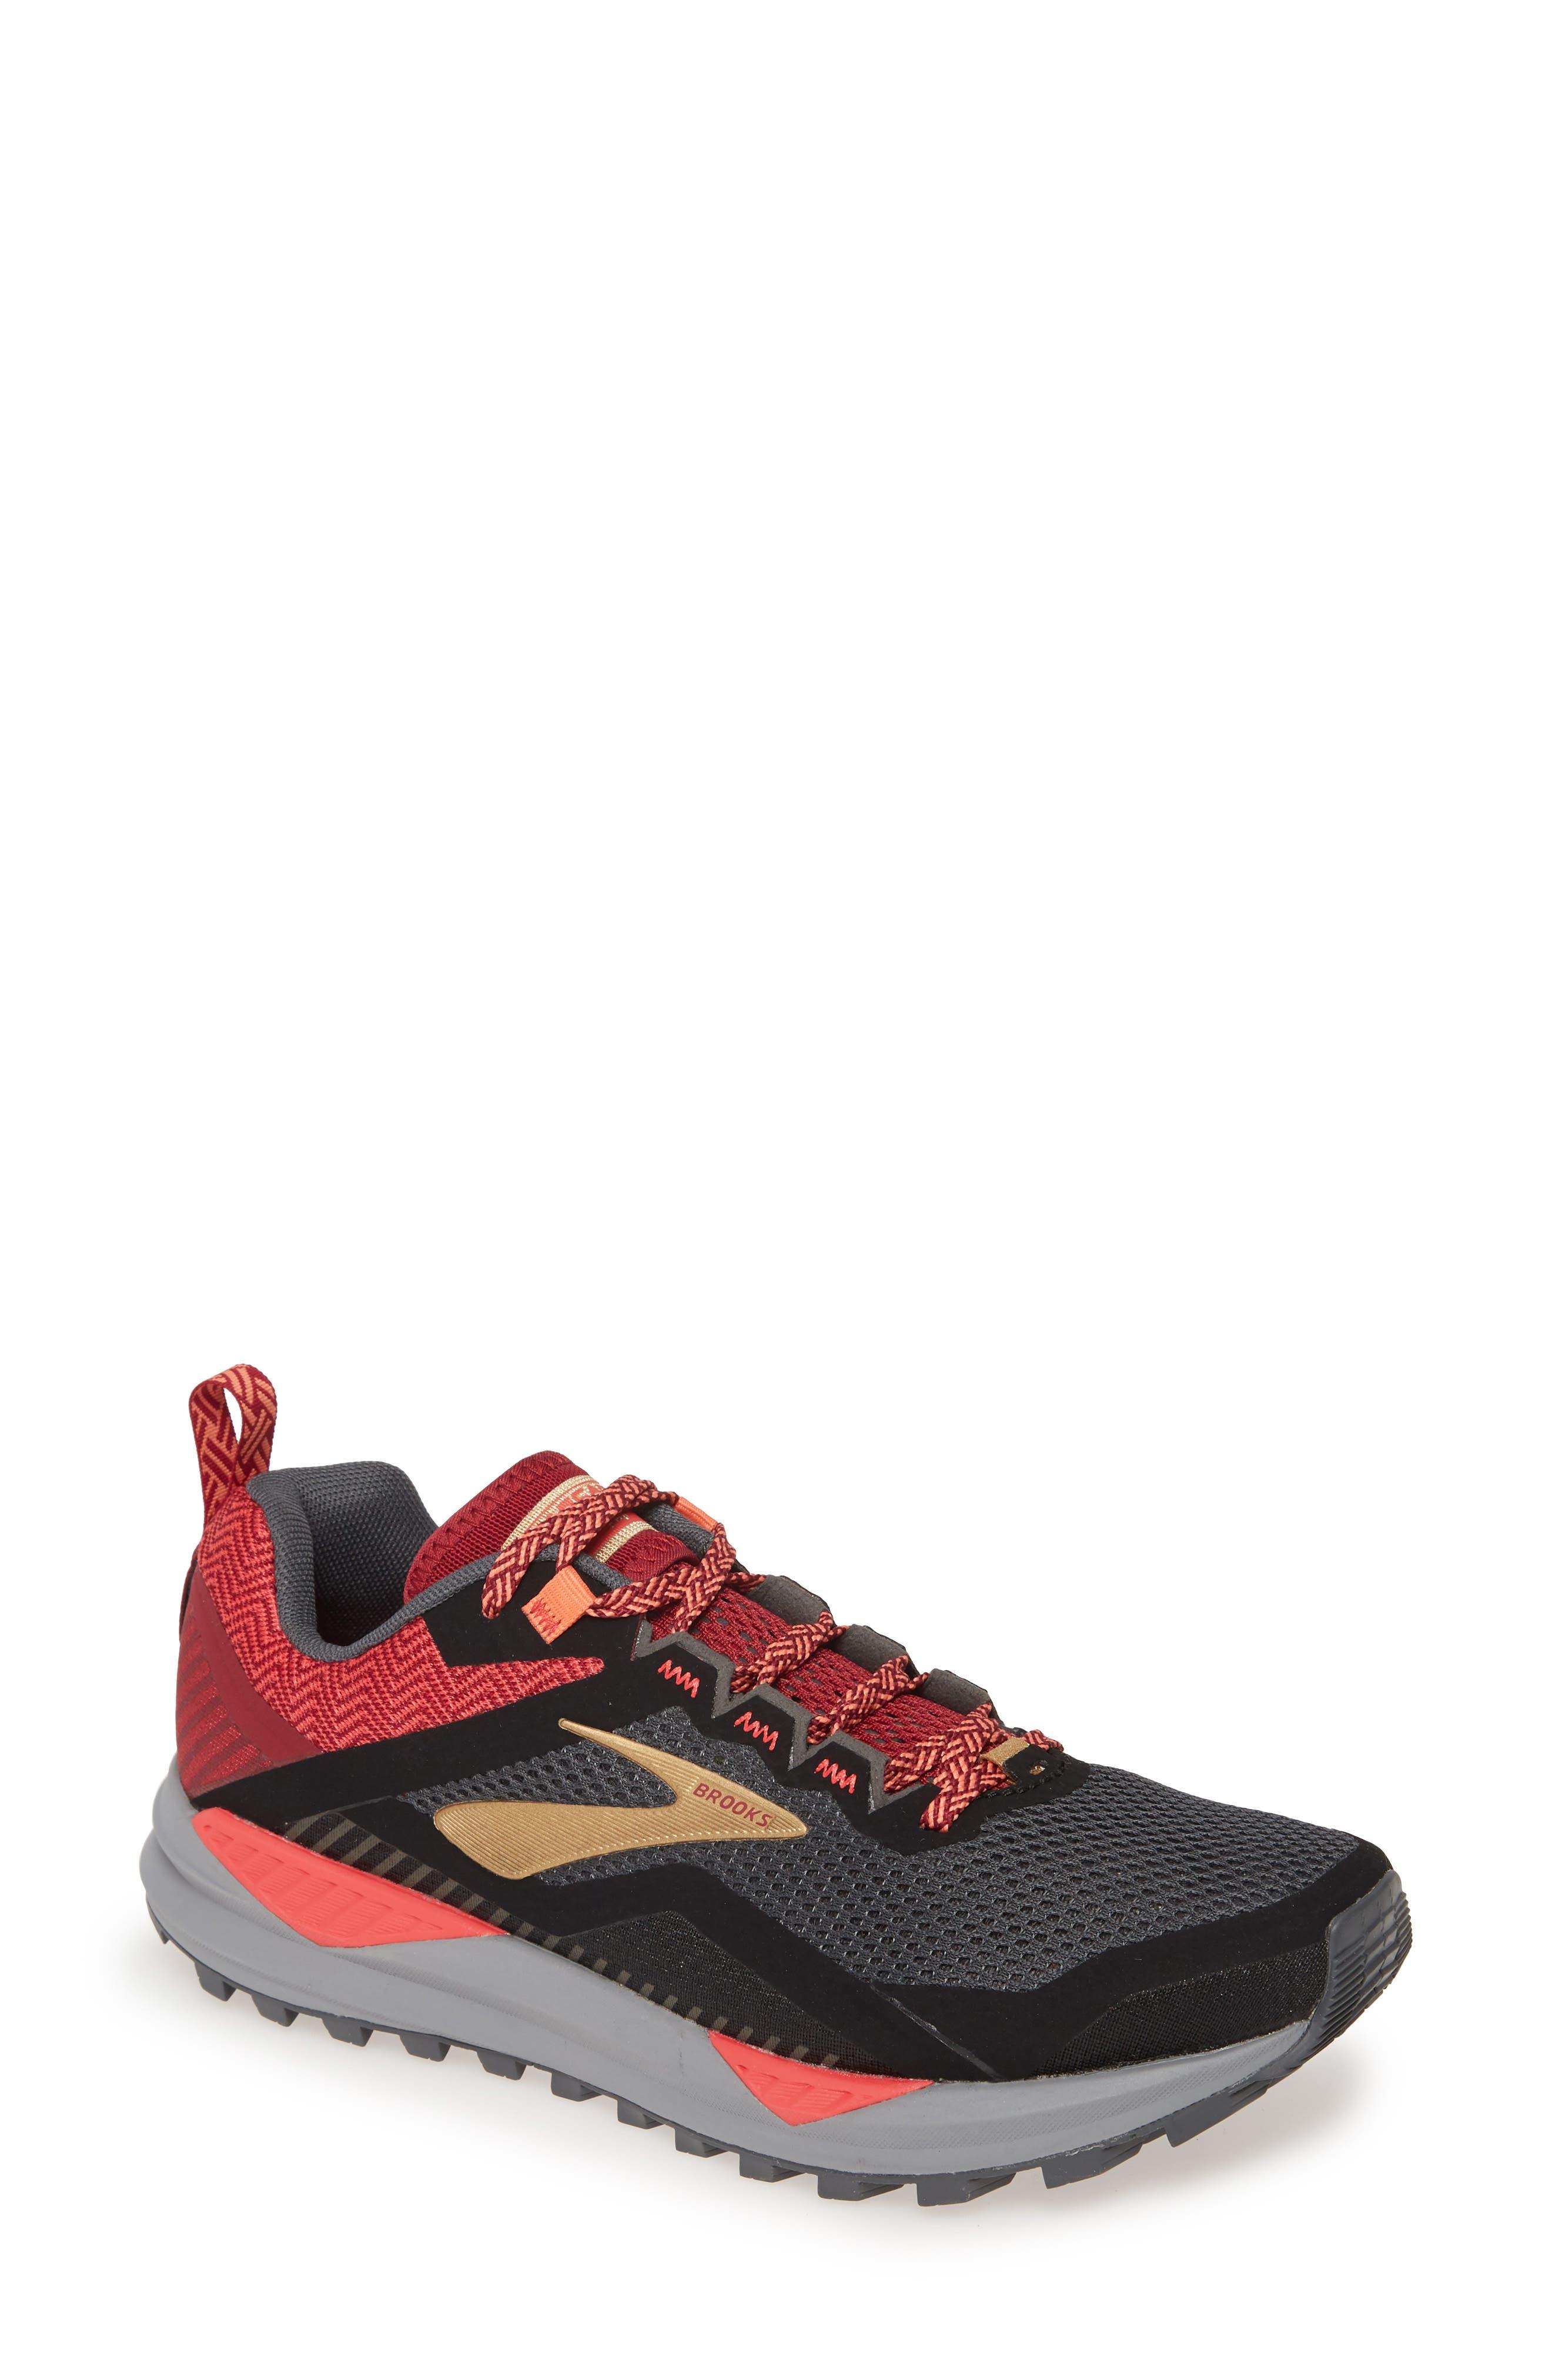 Brooks | Cascadia 14 Trail Running Shoe